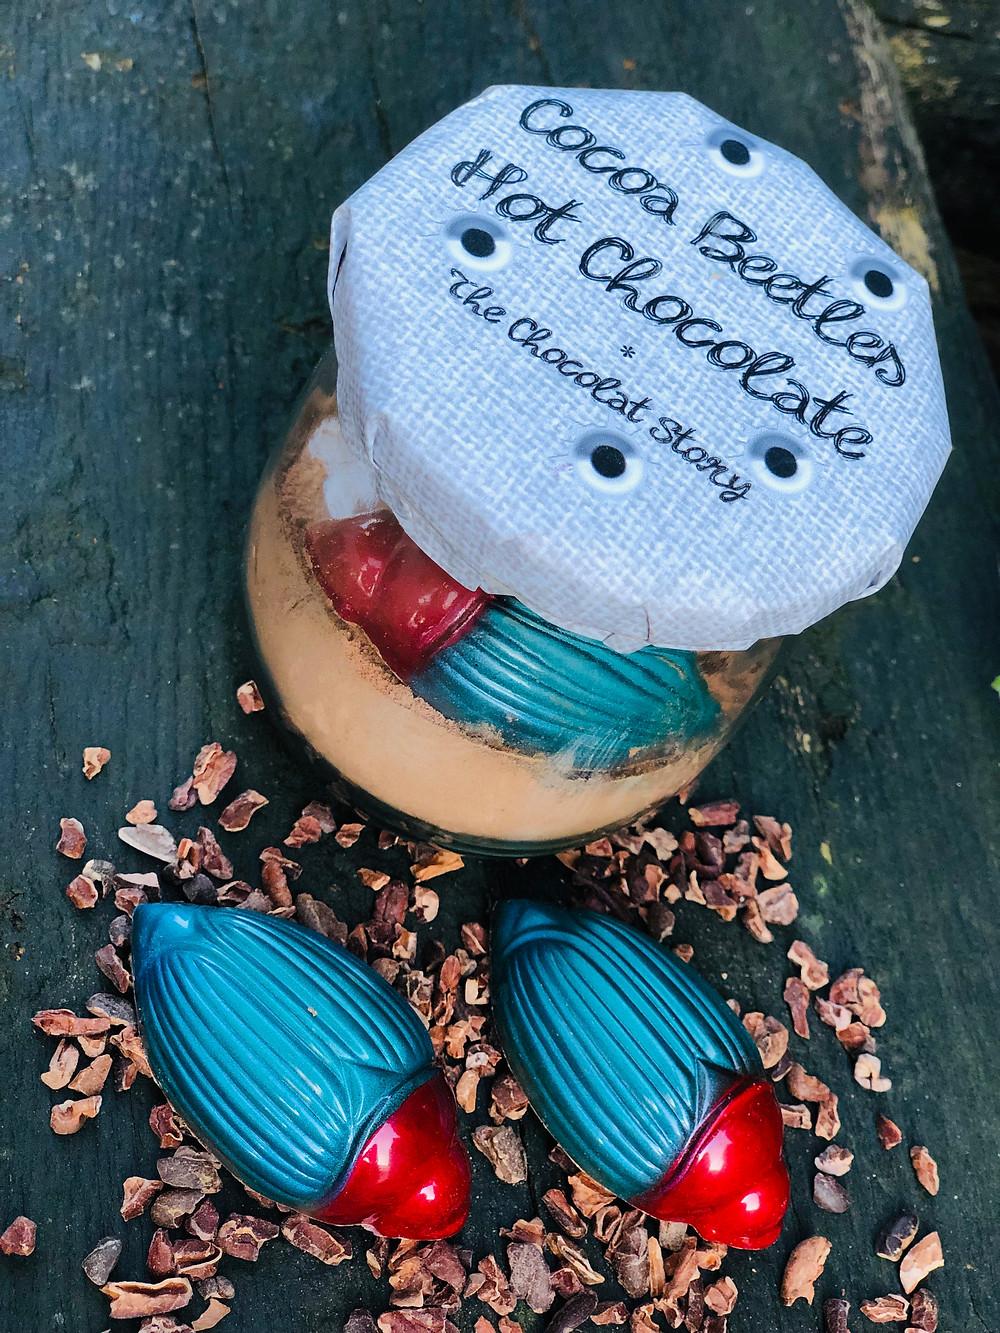 Cocoa beetles packaging